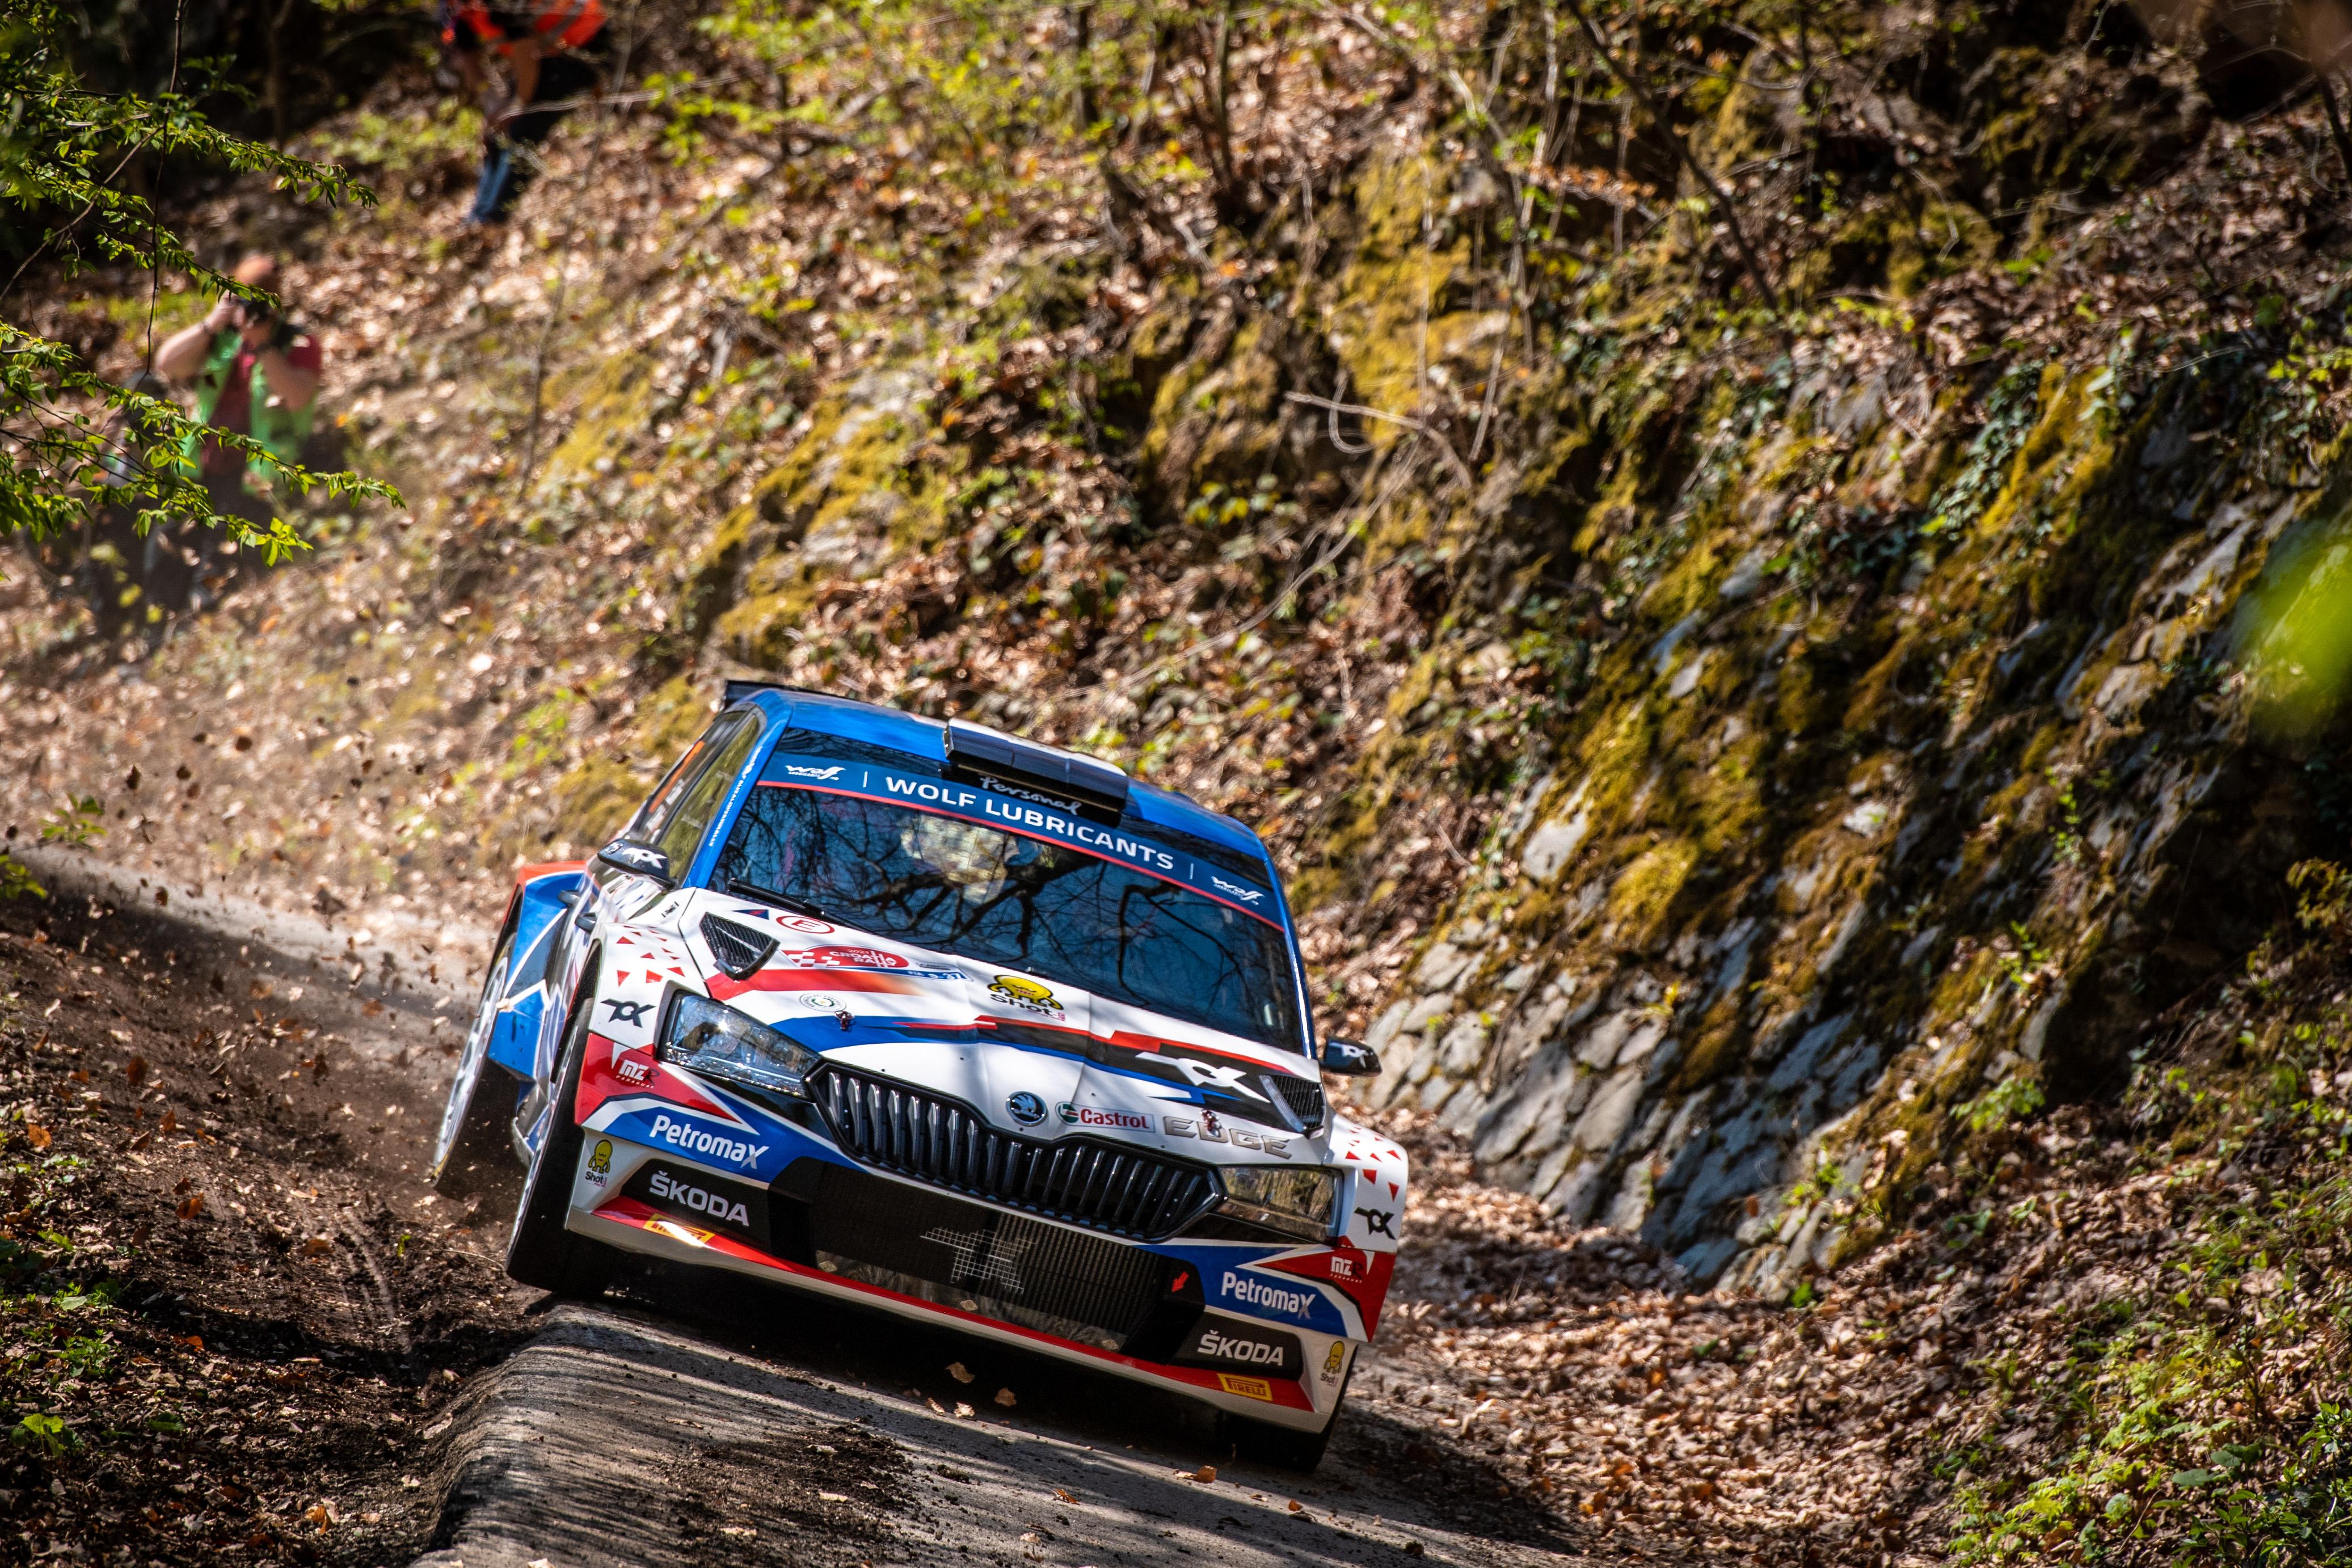 Rally Croatia: SKODA FABIA Rally2 evo crews storm to convincing 1-2-3 in WRC3 category - Image 4